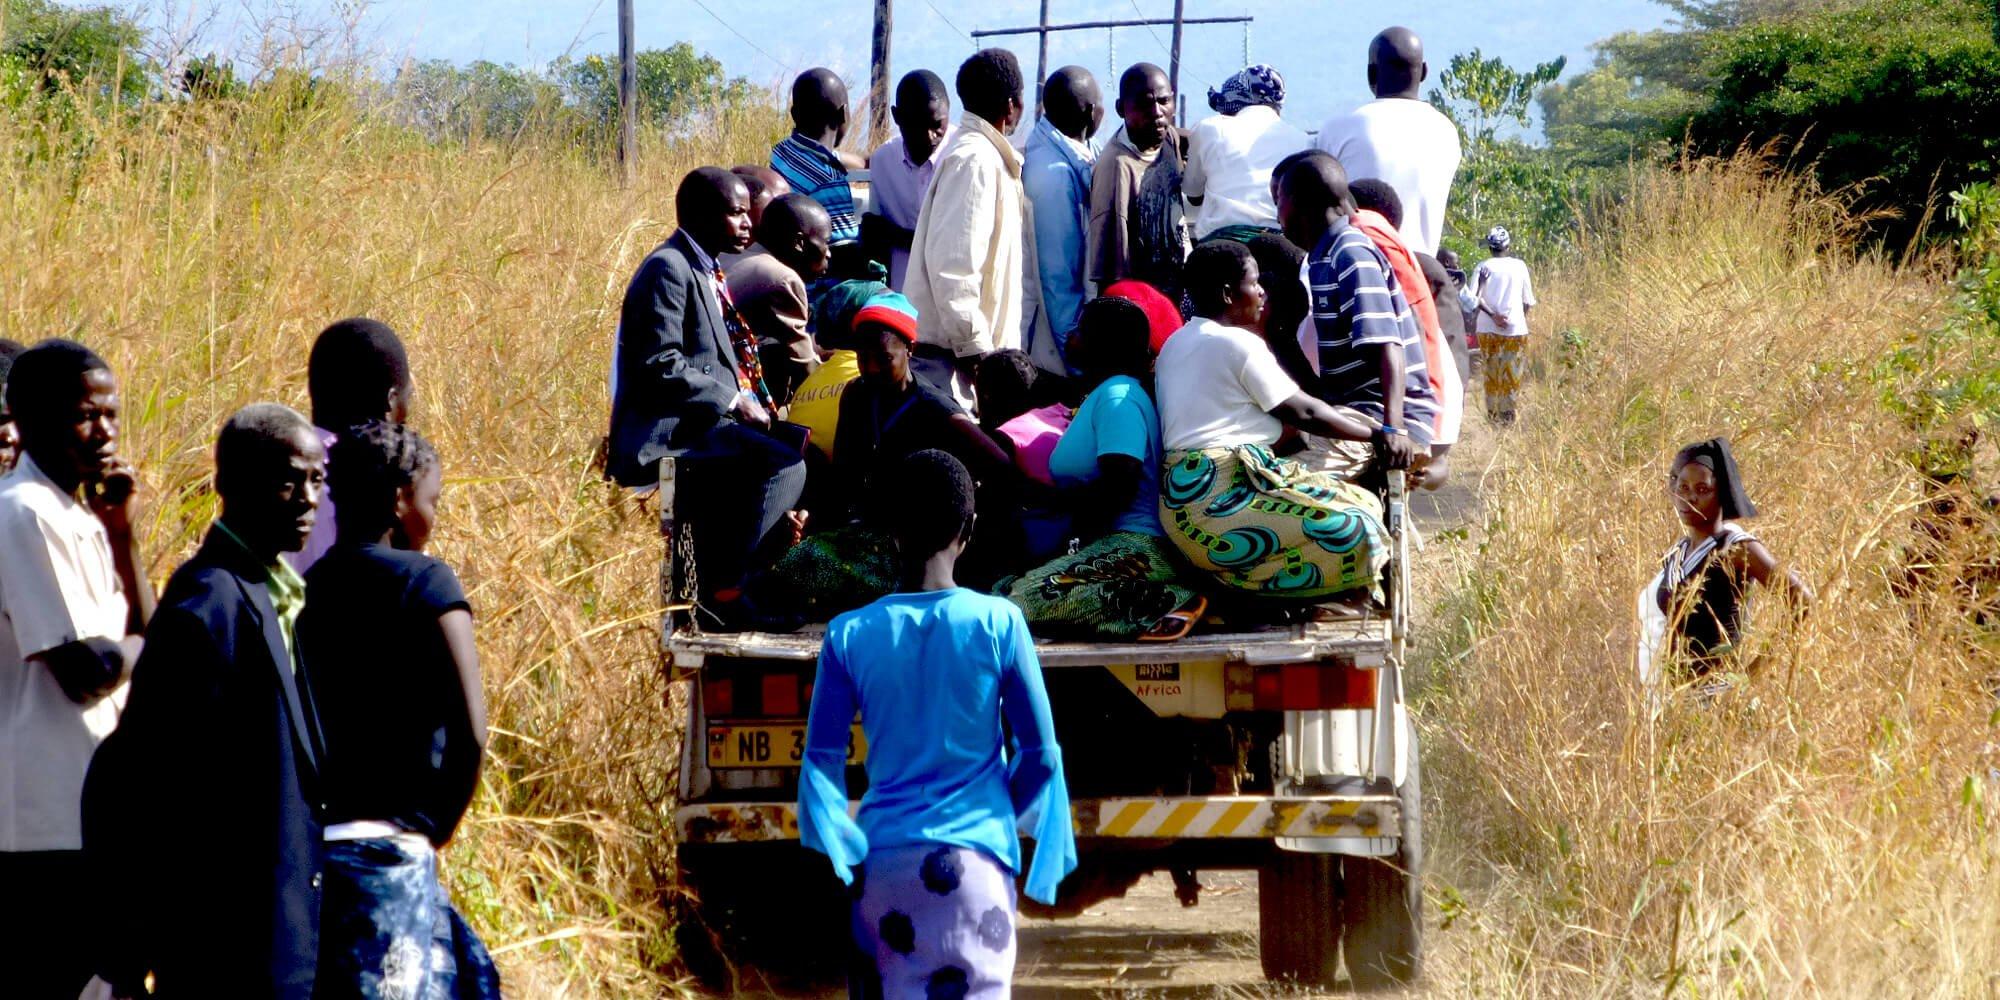 Lorry Malawi Ripple Africa